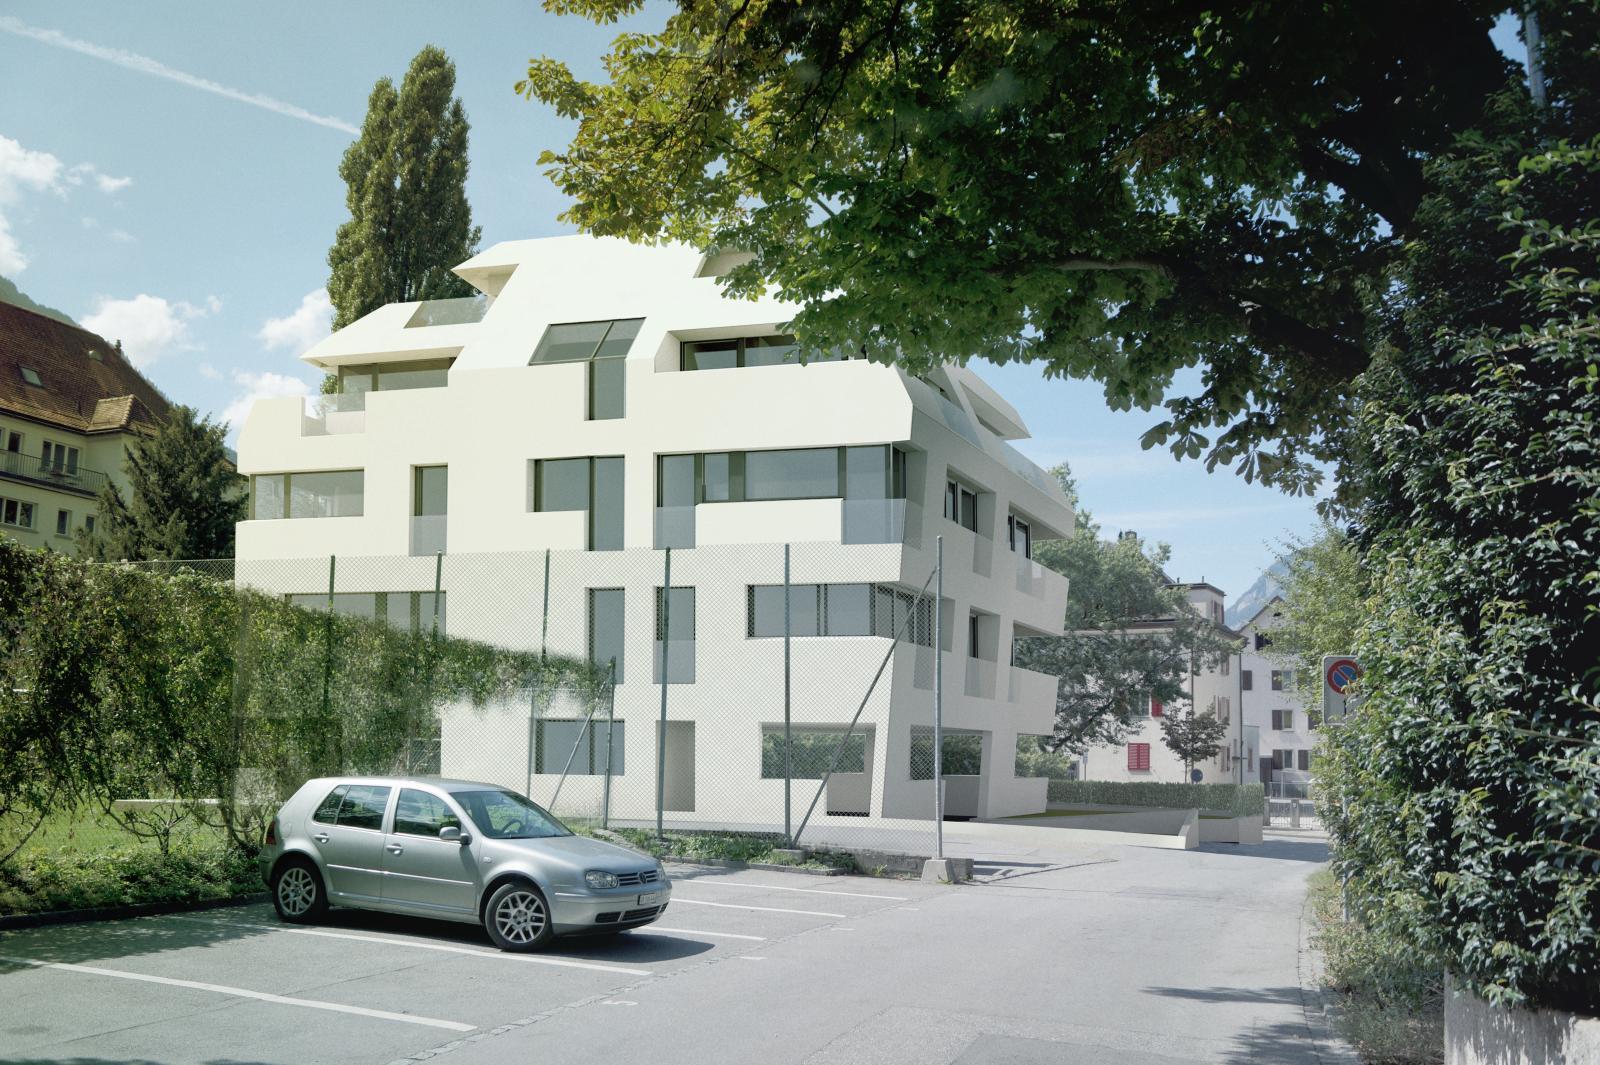 duc-ii_neubruchstrasse